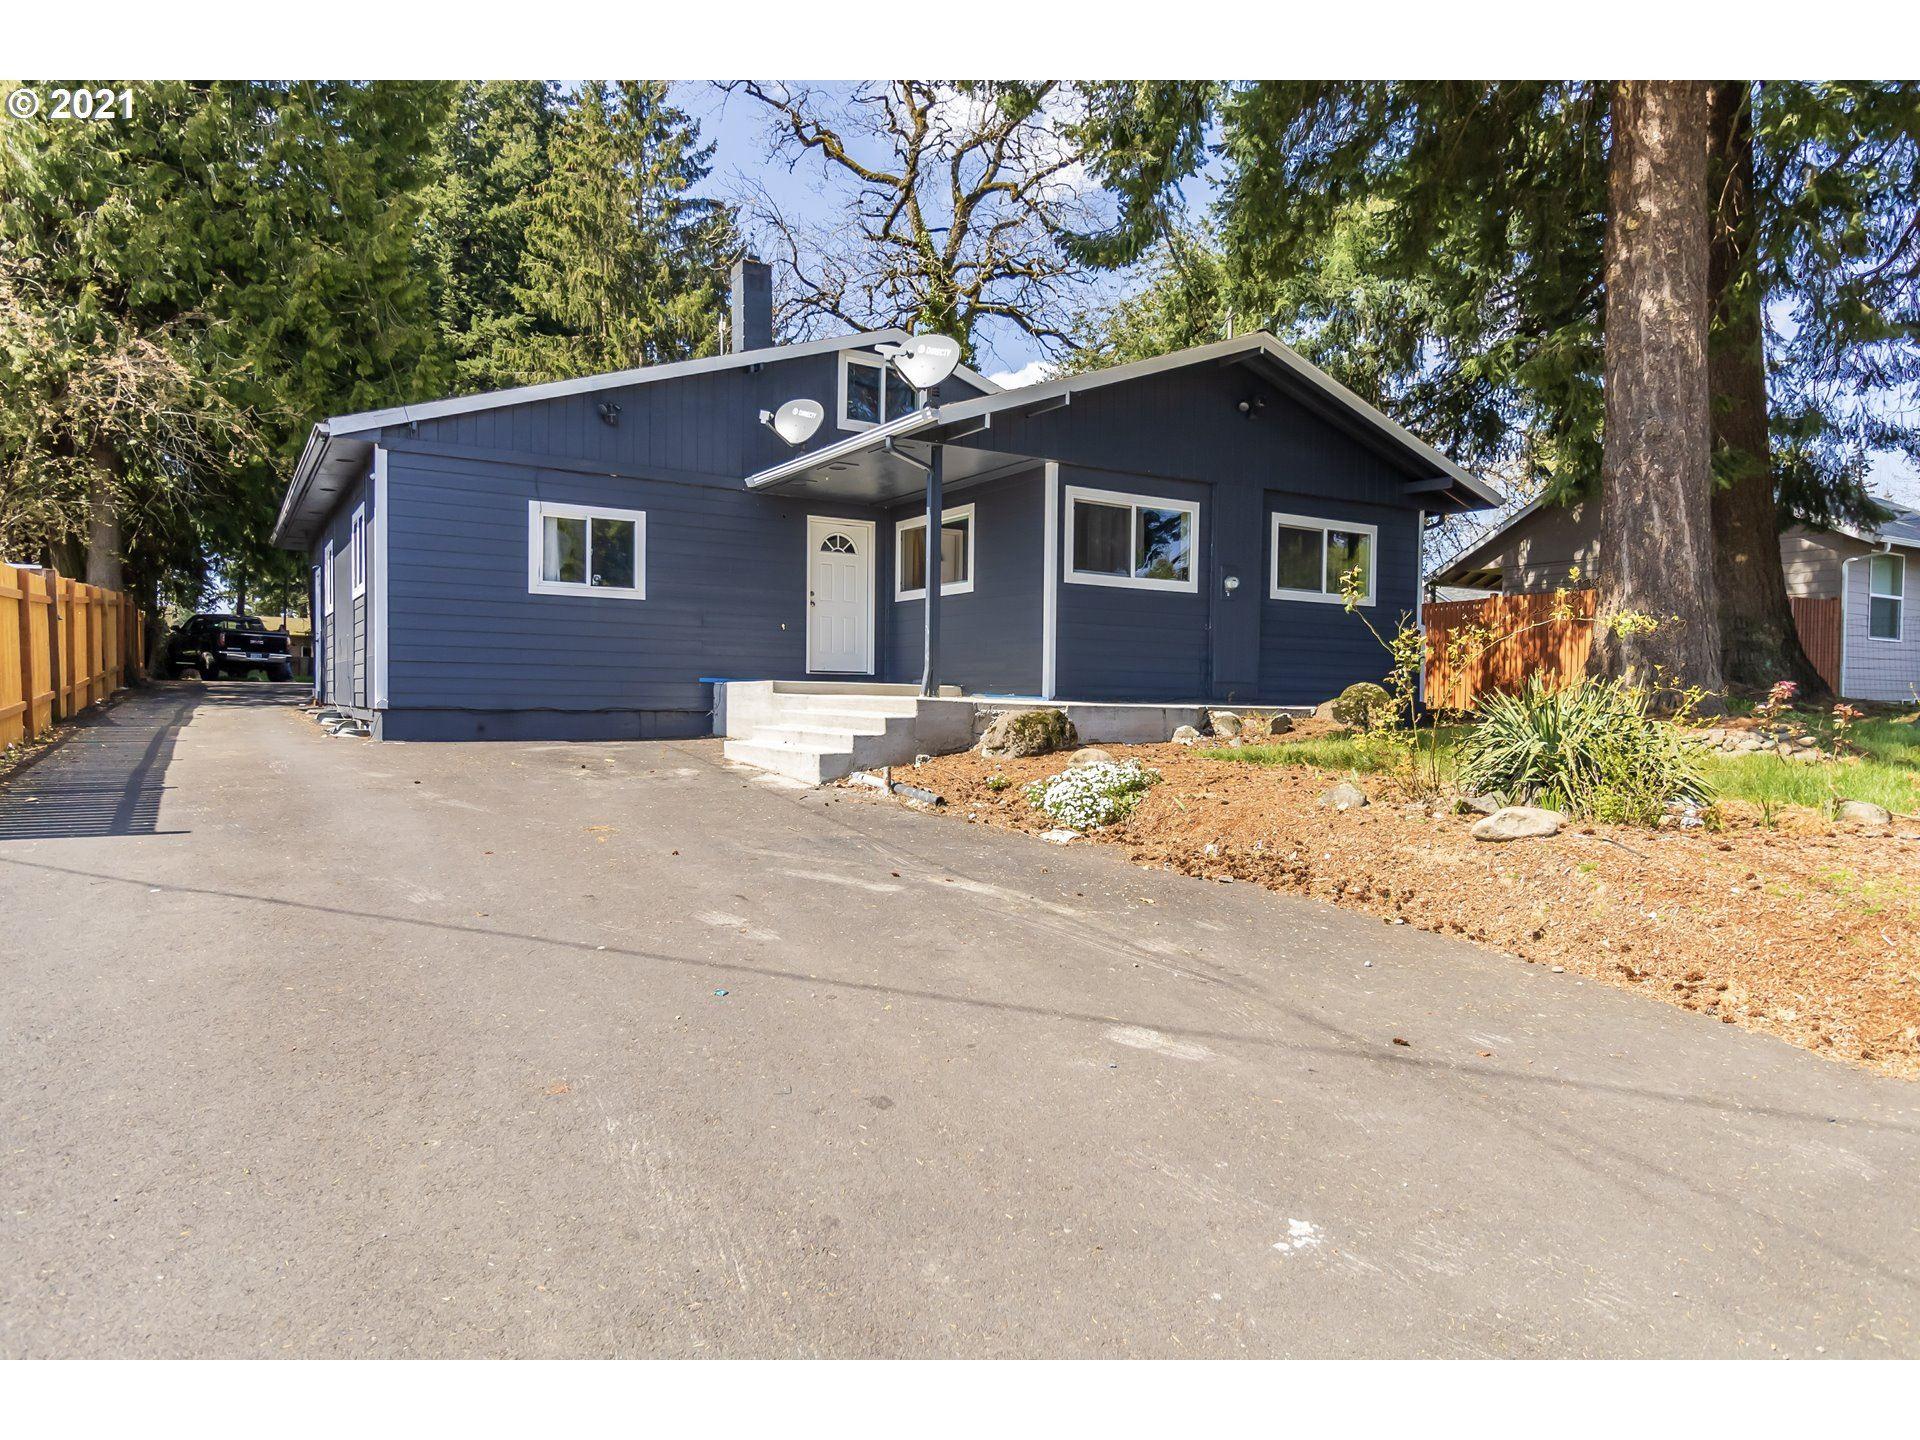 321 NE 162ND AVE, Portland, OR 97230 - MLS#: 21255415